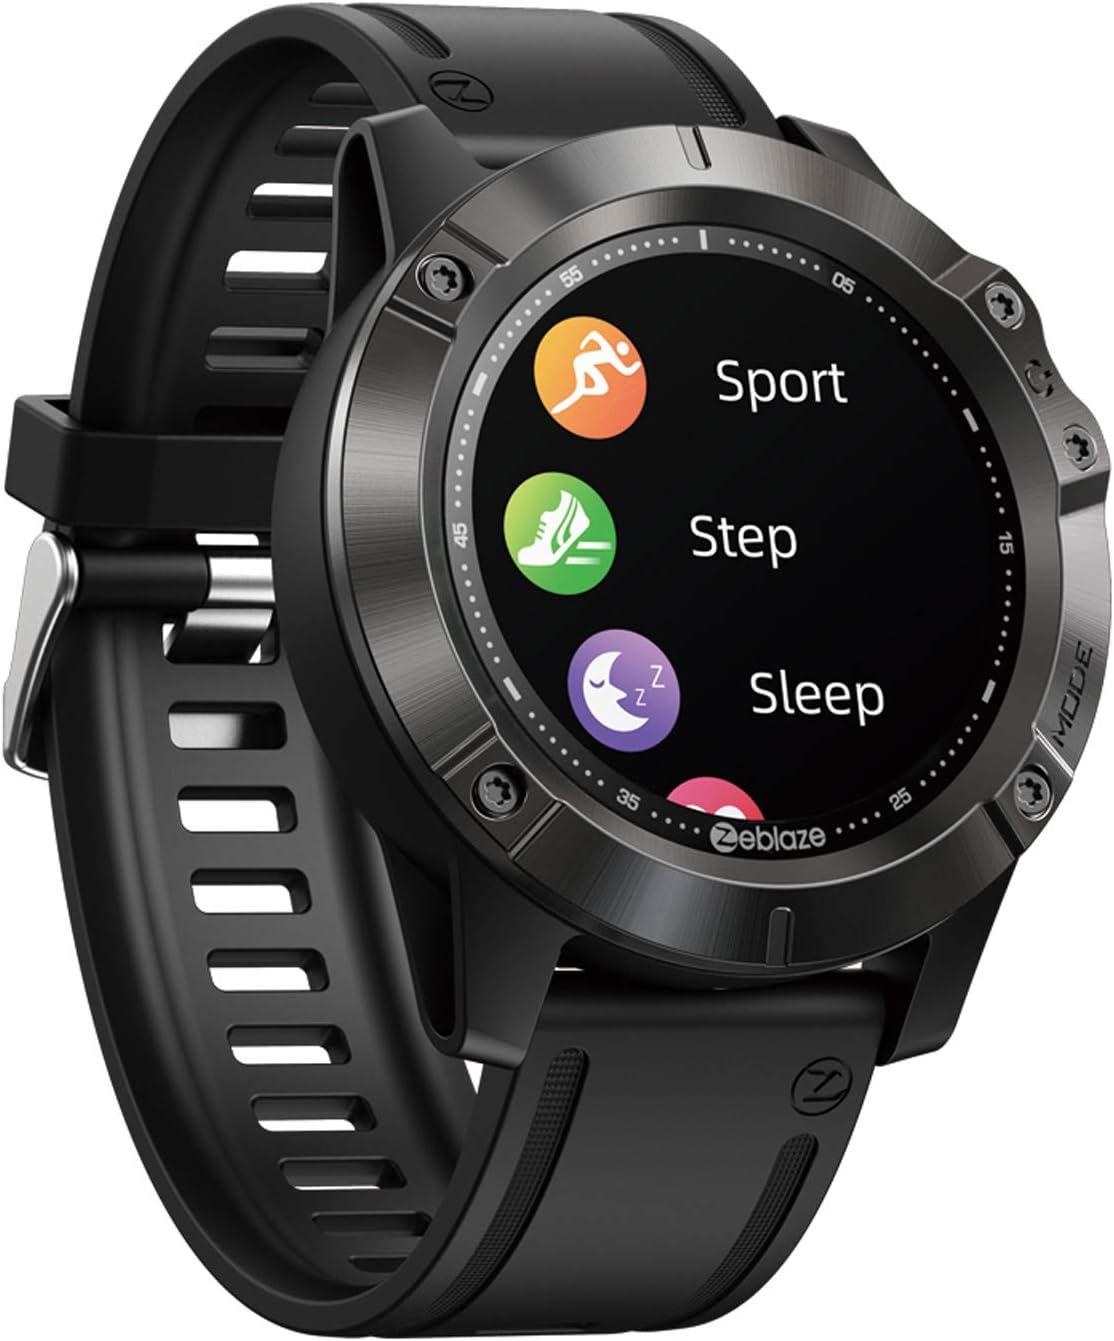 SUQIAOQIAO Zeblaze Vibe 6 Smart Watch Heart Rate Bluetooth Call, 1.3 Inch IPS Color Touch Screen Bracelet 300Mah Battery Multi Sport Mode Waterproof,Black